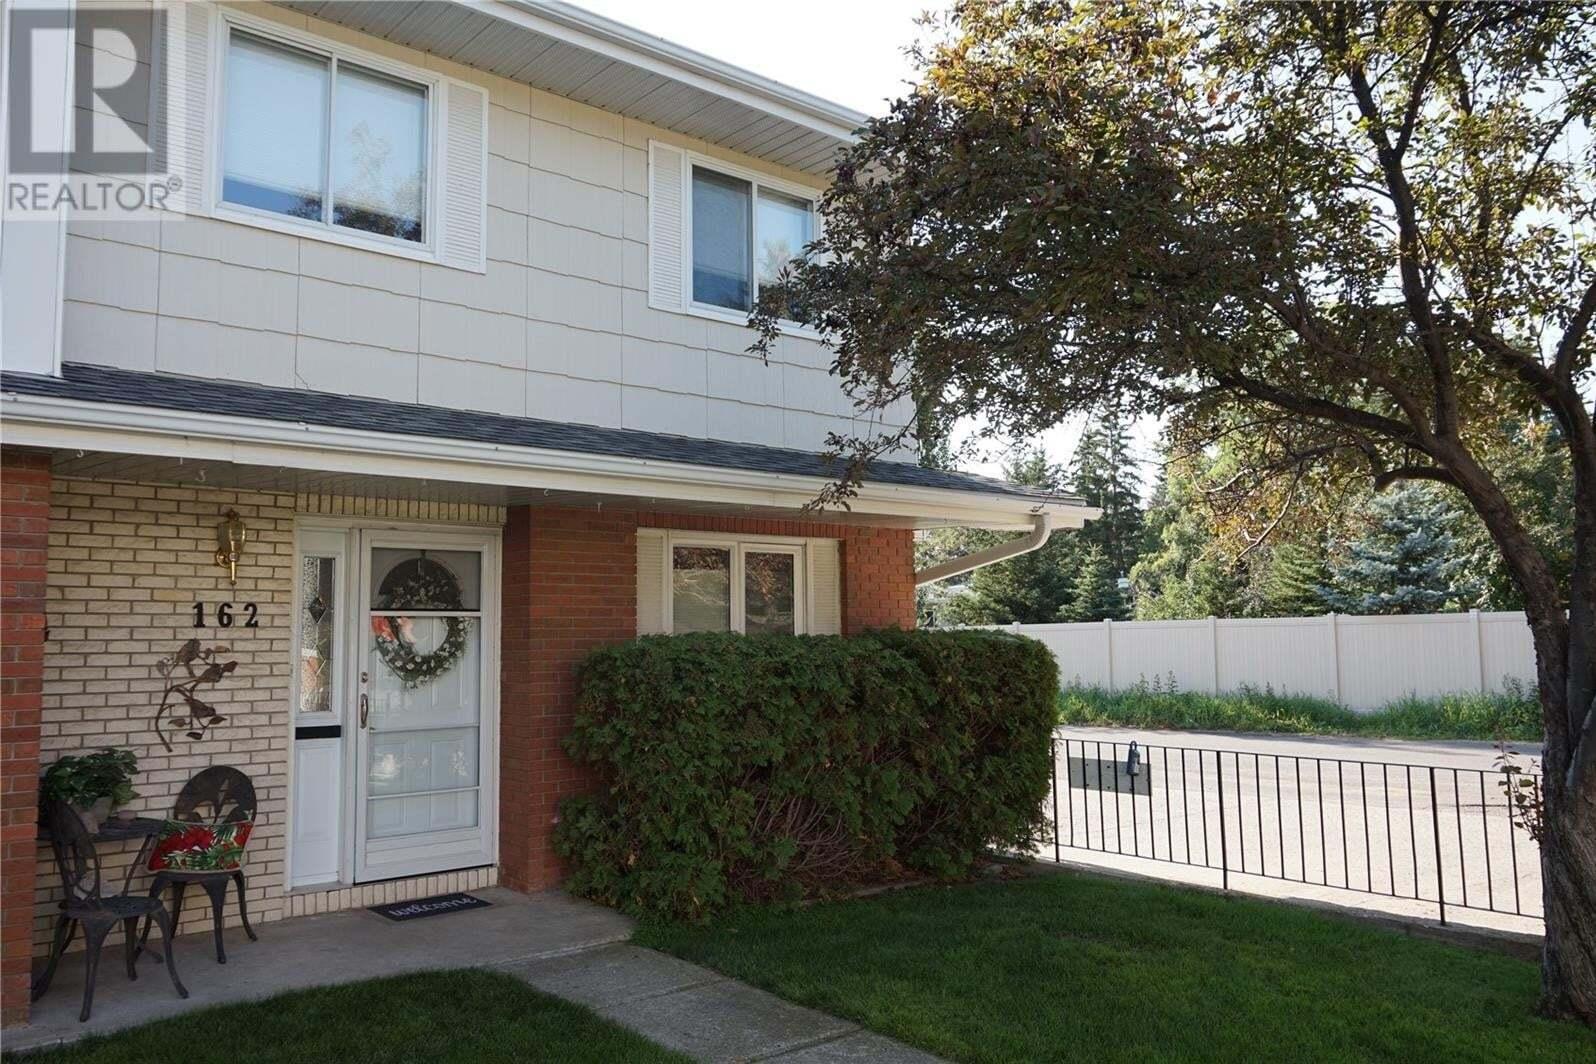 Townhouse for sale at 162 Plainsview Dr Regina Saskatchewan - MLS: SK819208